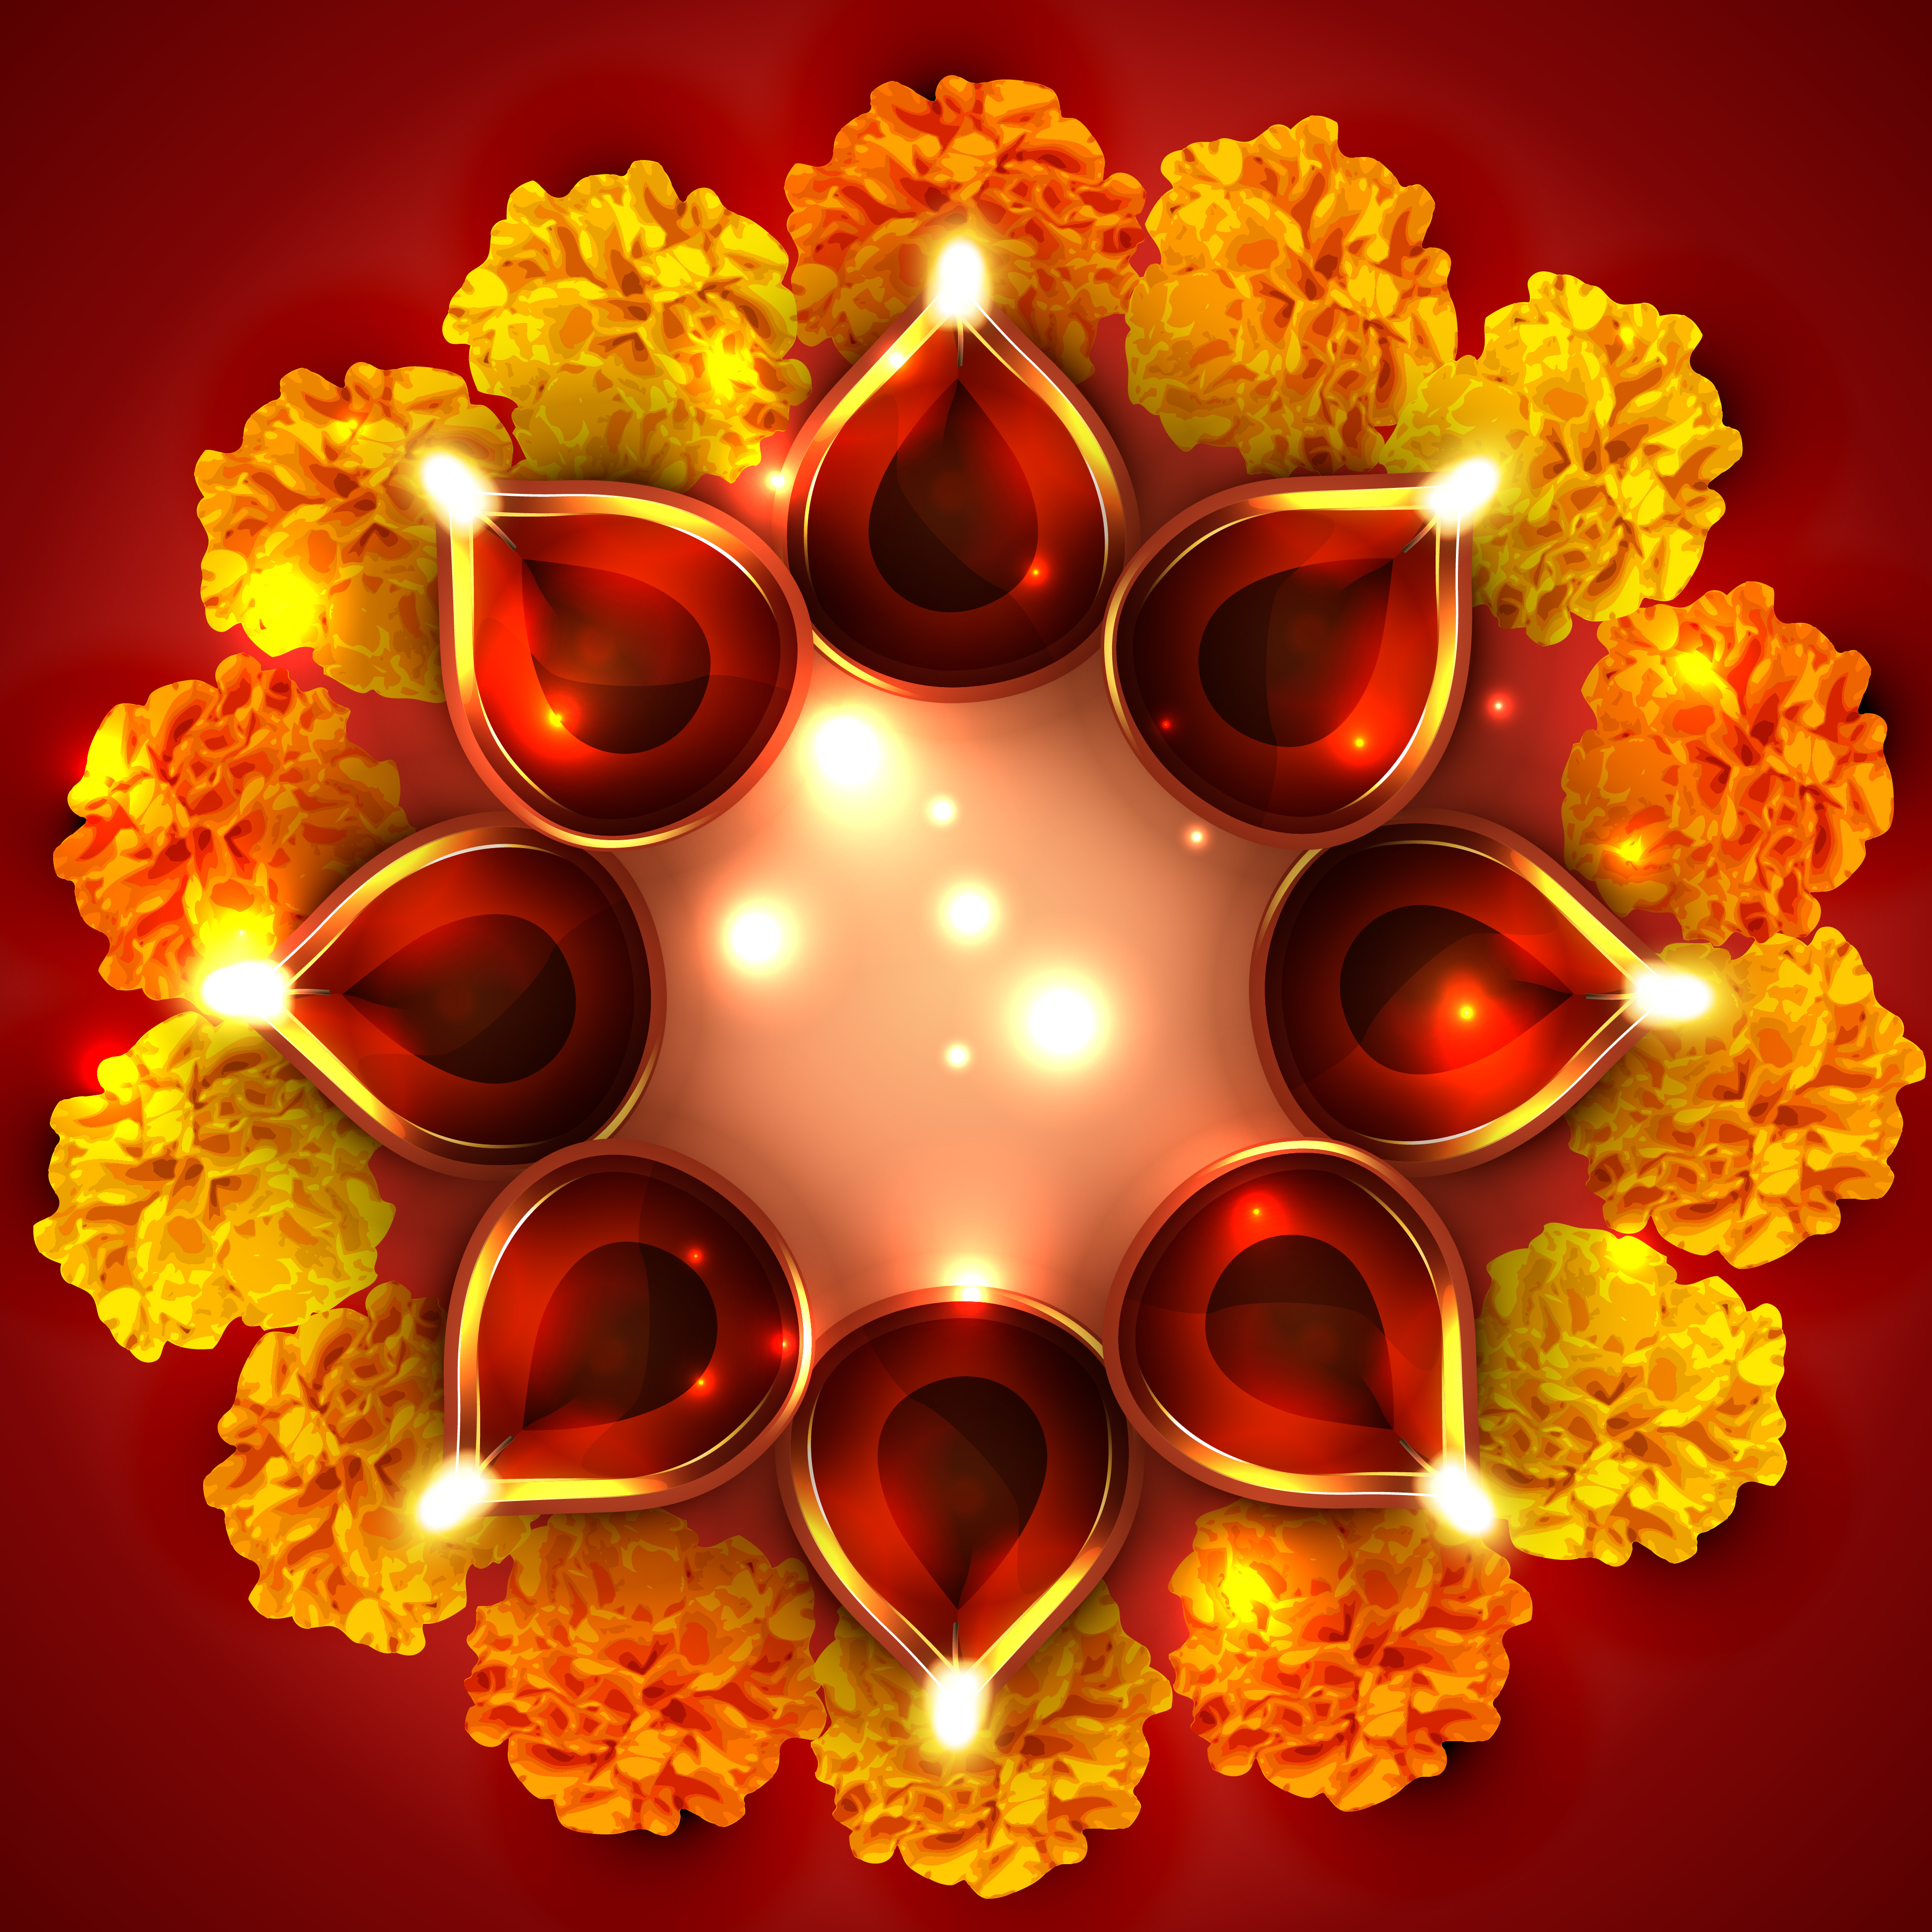 Background Of Diwali Diya Download Free Vector Art